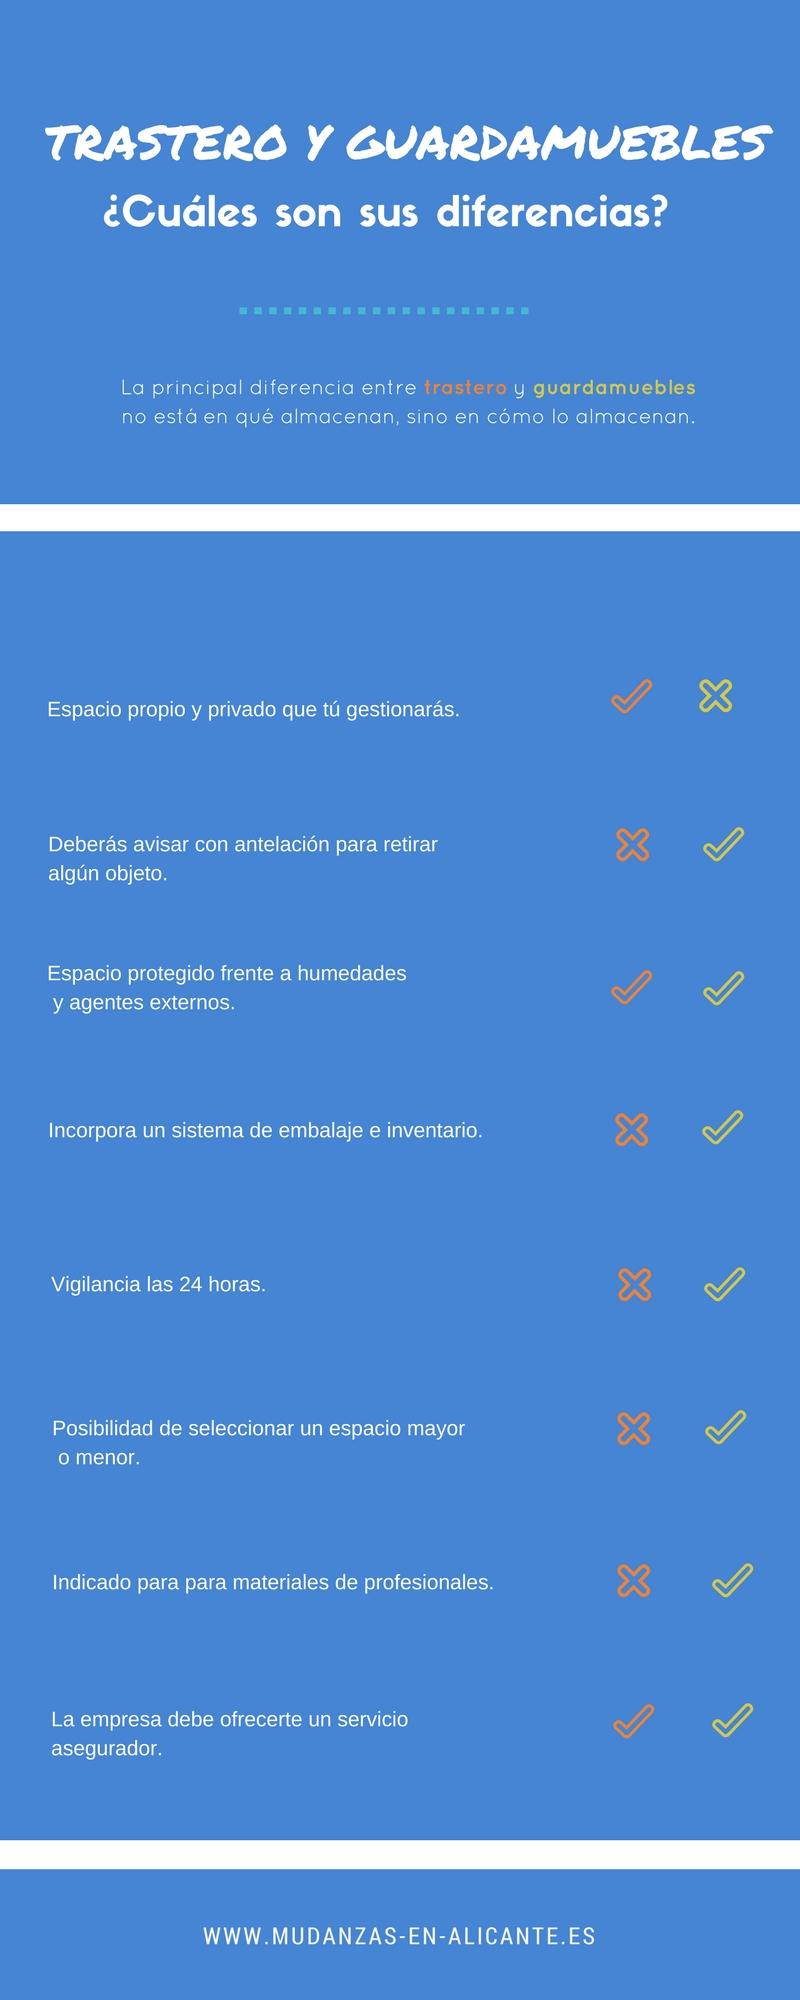 infografia-diferencias-trastero-guardamuebles